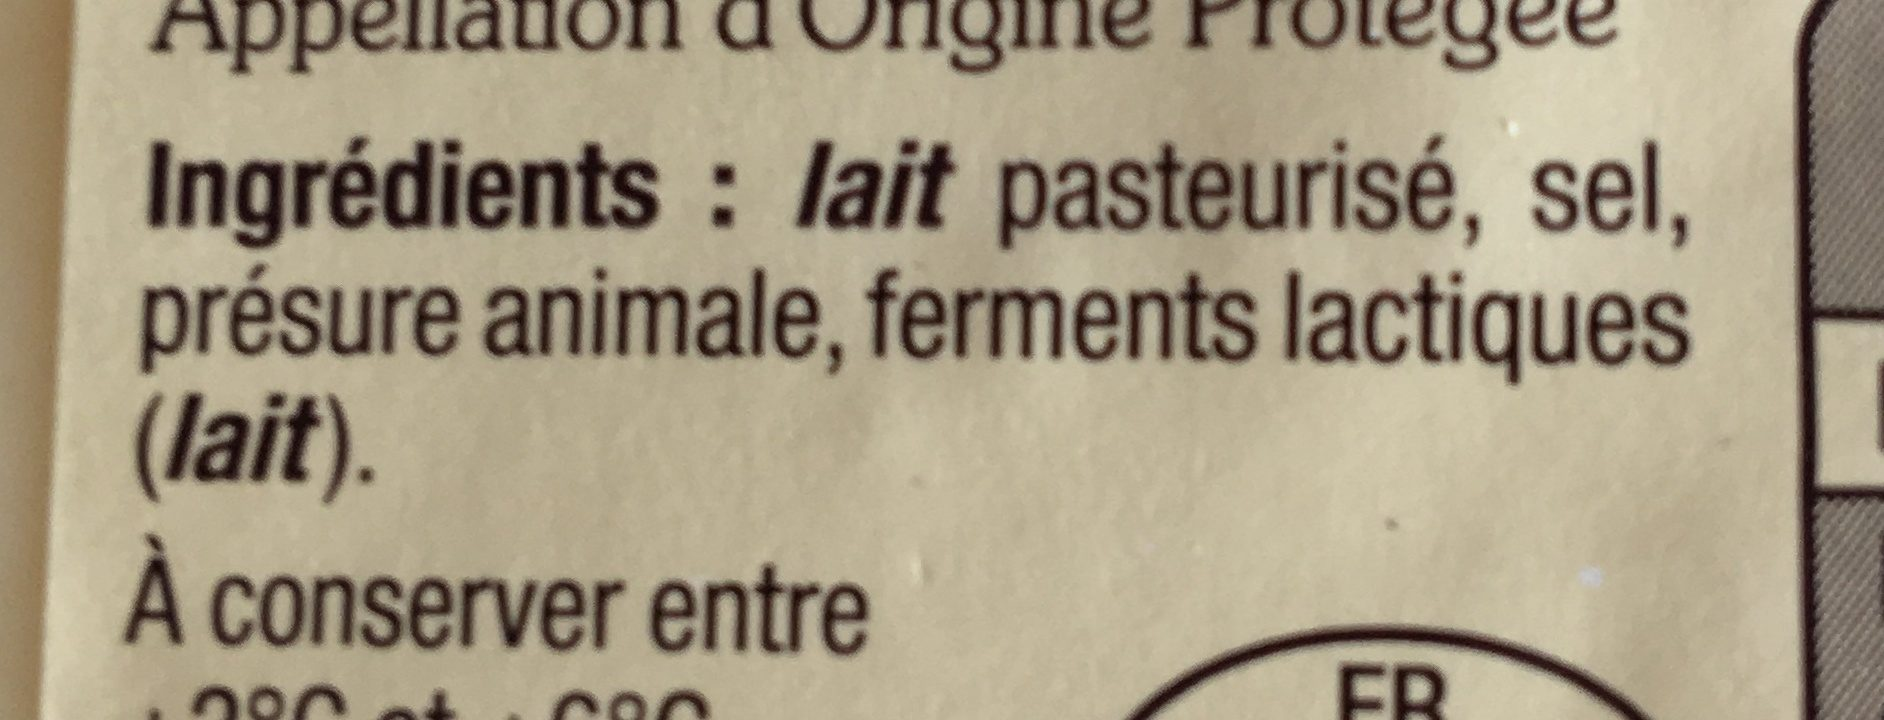 Cantal entre-deux - Ingredients